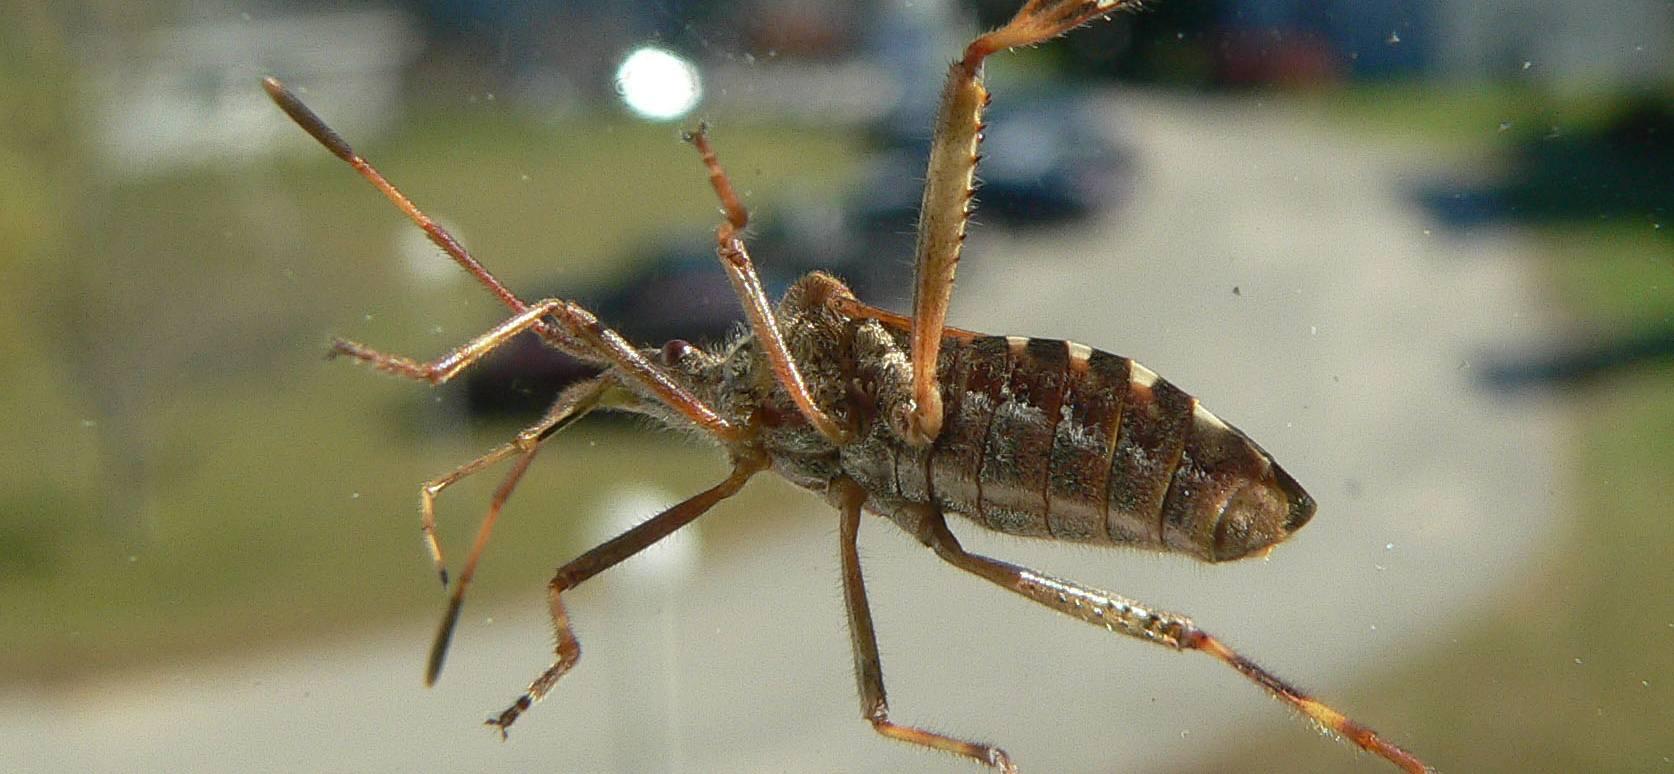 Polacy owad w domach